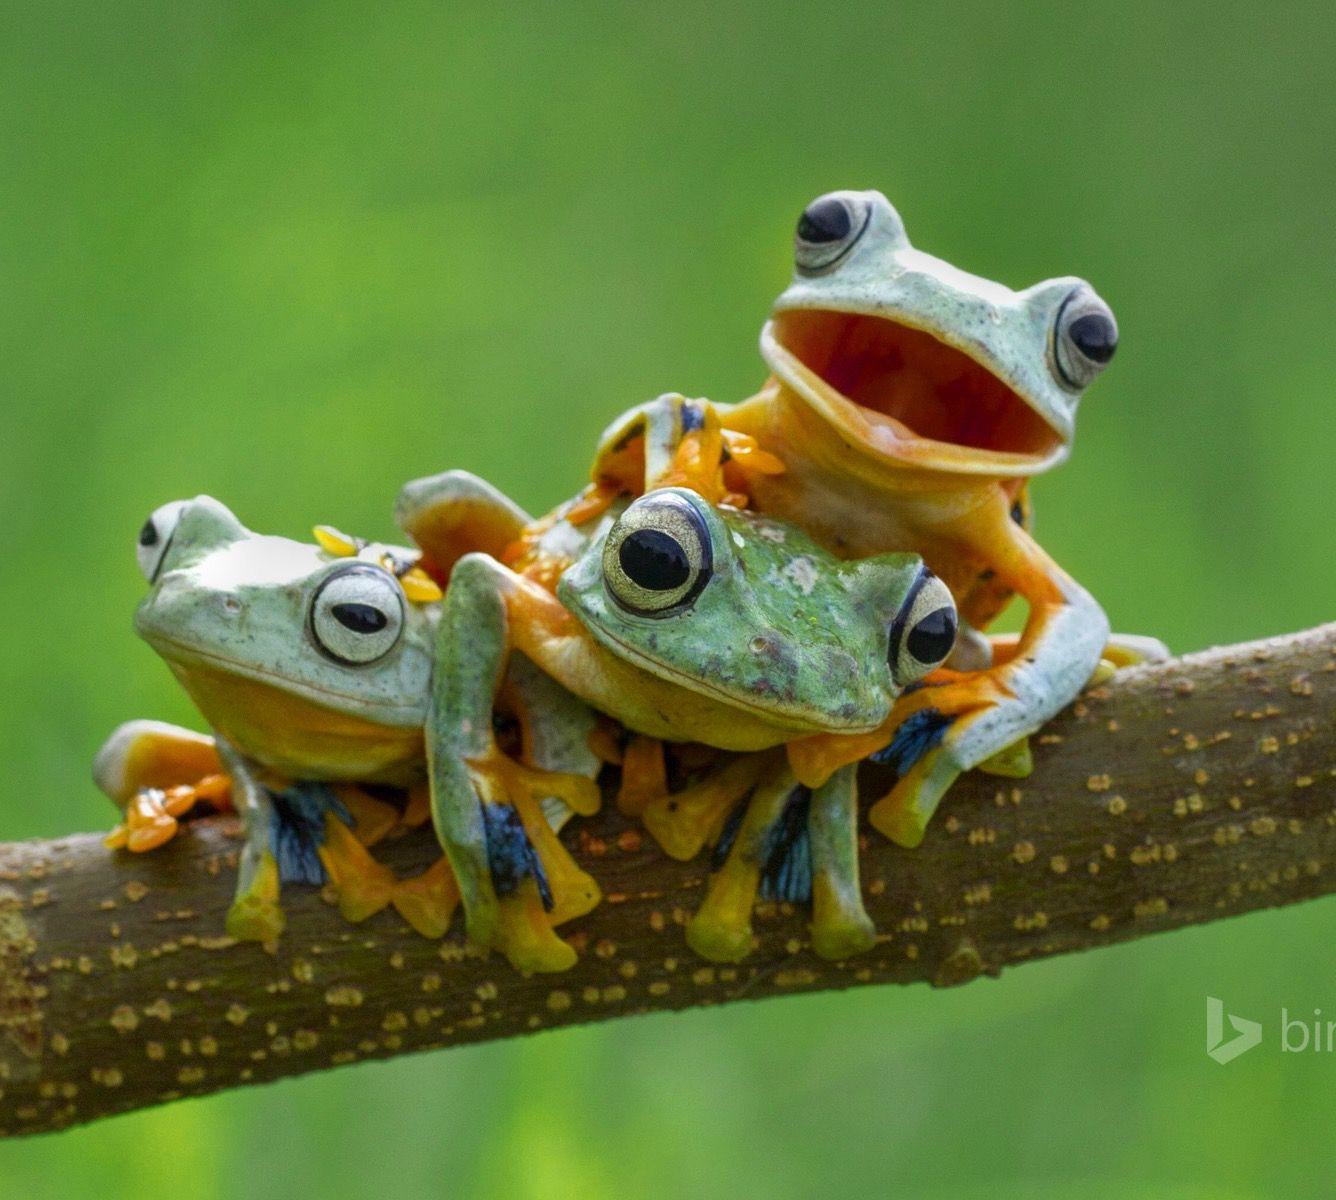 Black webbed tree frog Animali, Animali divertenti